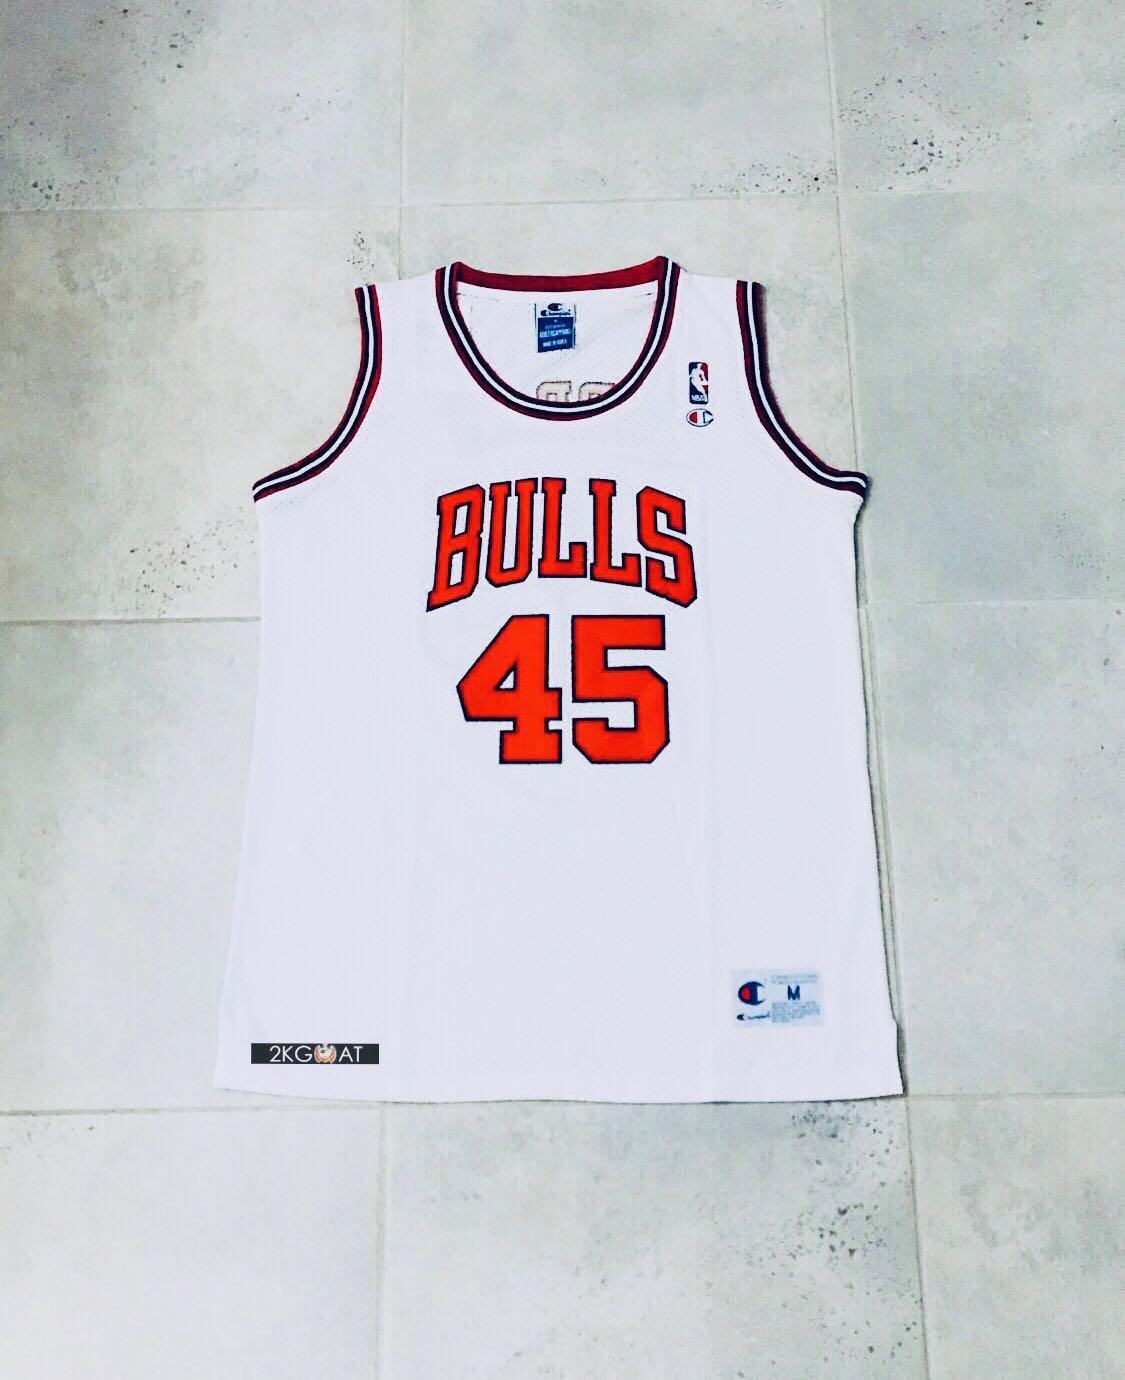 huge selection of 740b6 1a6d0 Michael Jordan 45 RARE NBA Basketball Jersey, Men's Fashion ...